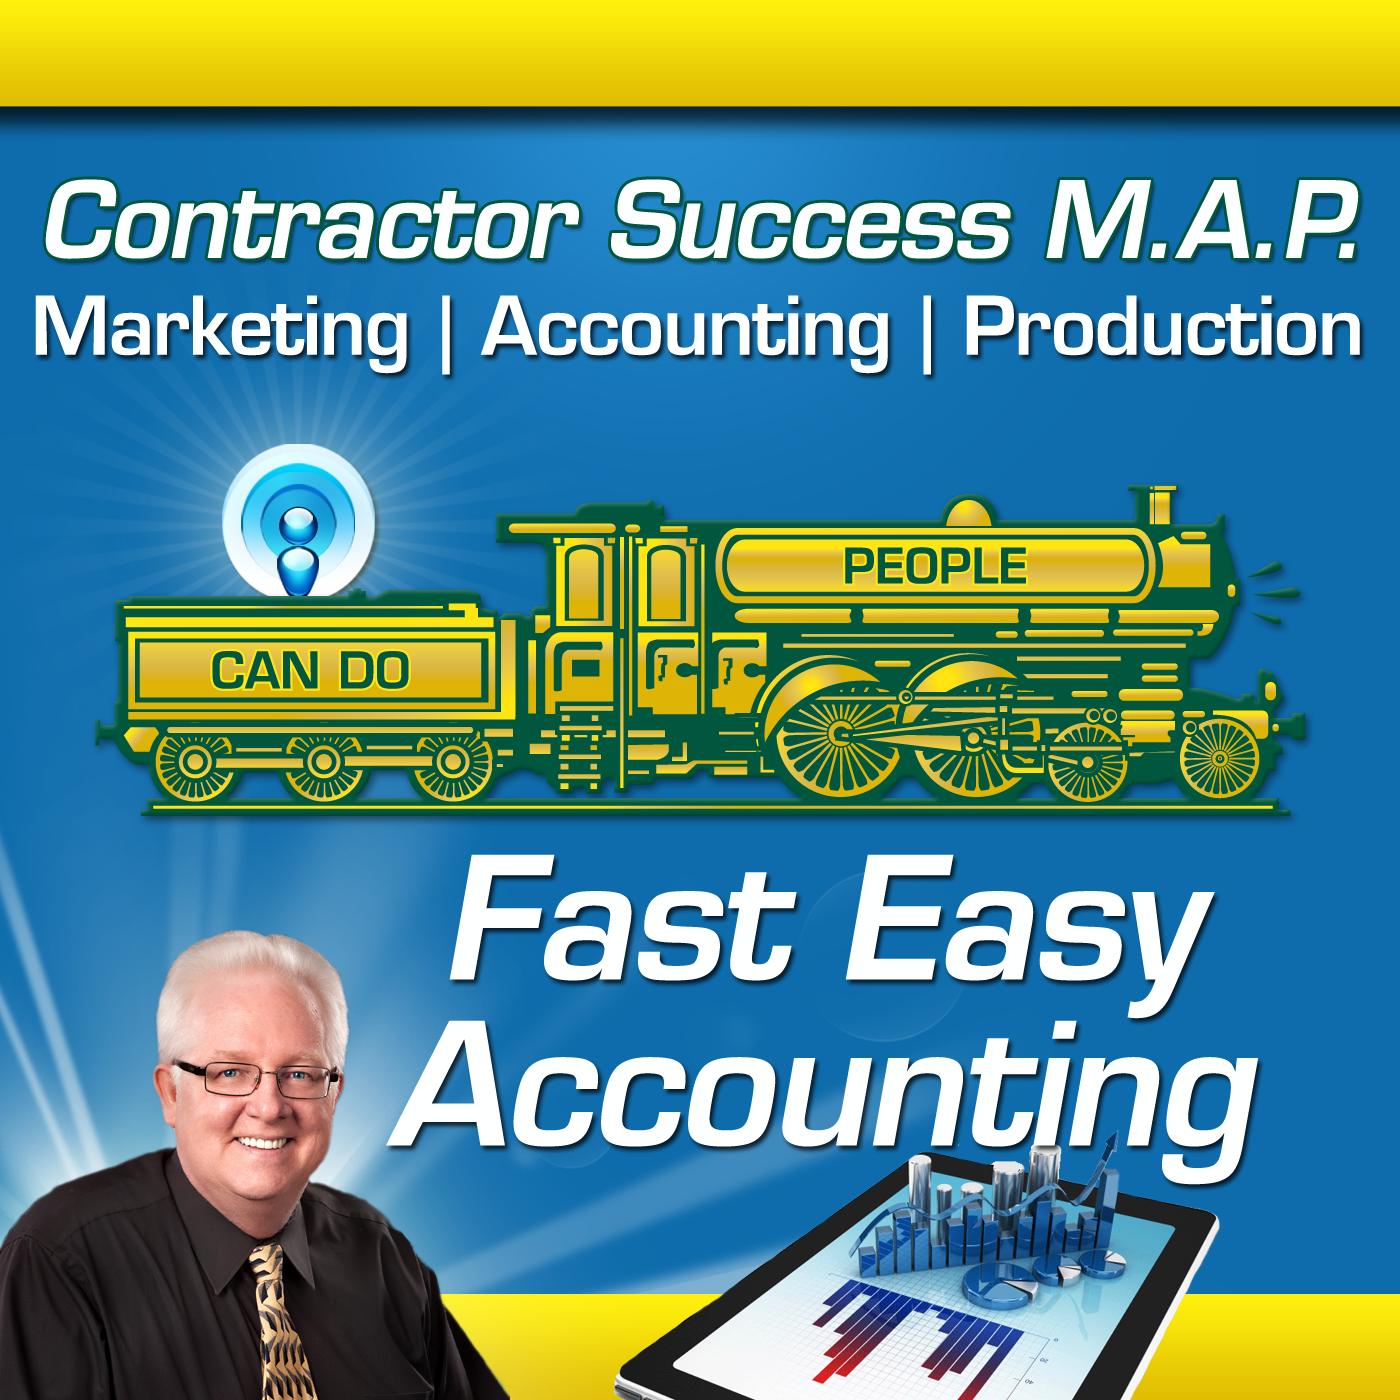 Fast Easy Accounting Contractors Success Map Album Art